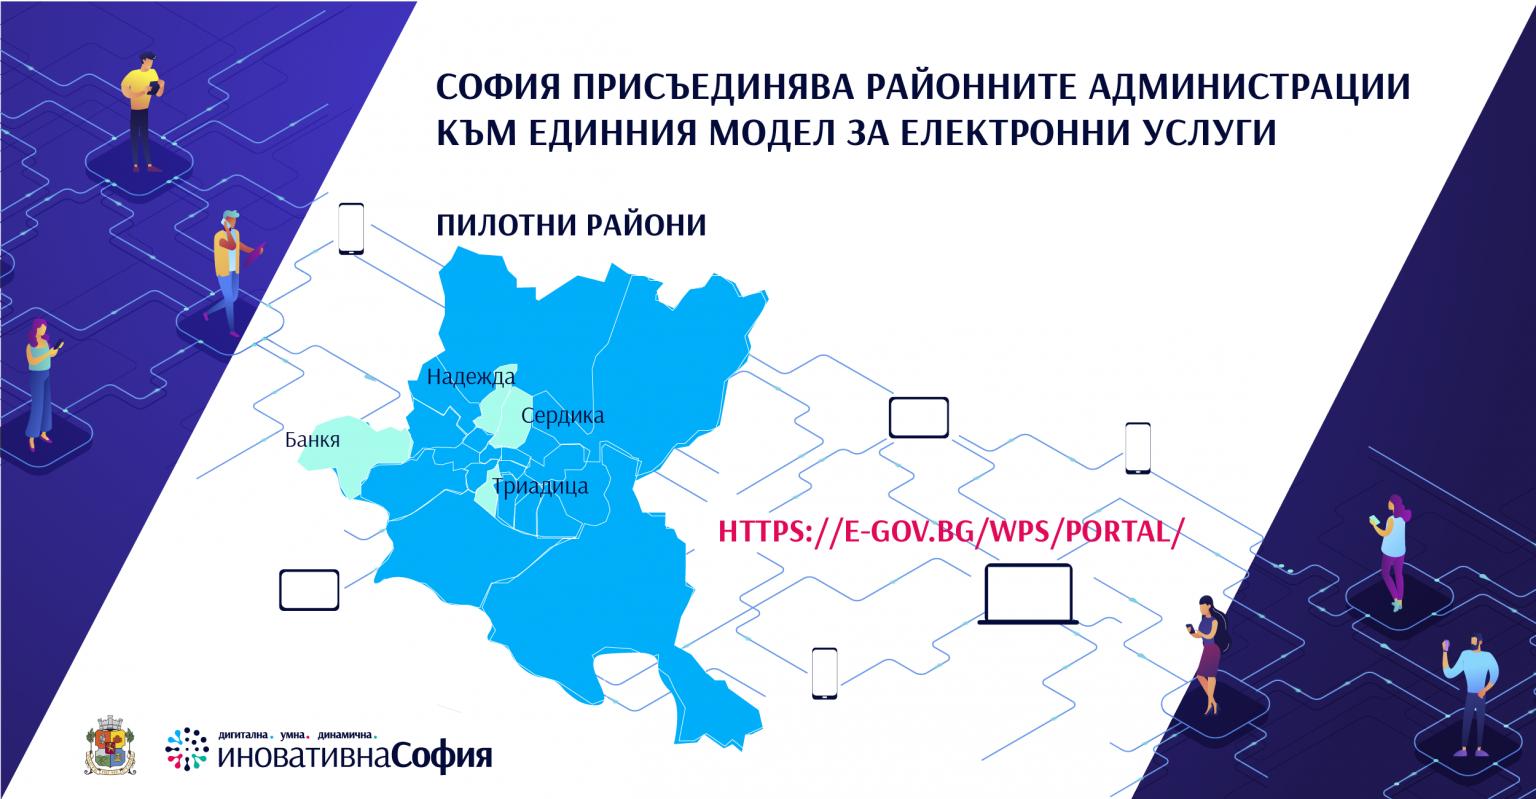 Four-Pilot-Districts-Sofia-e-services